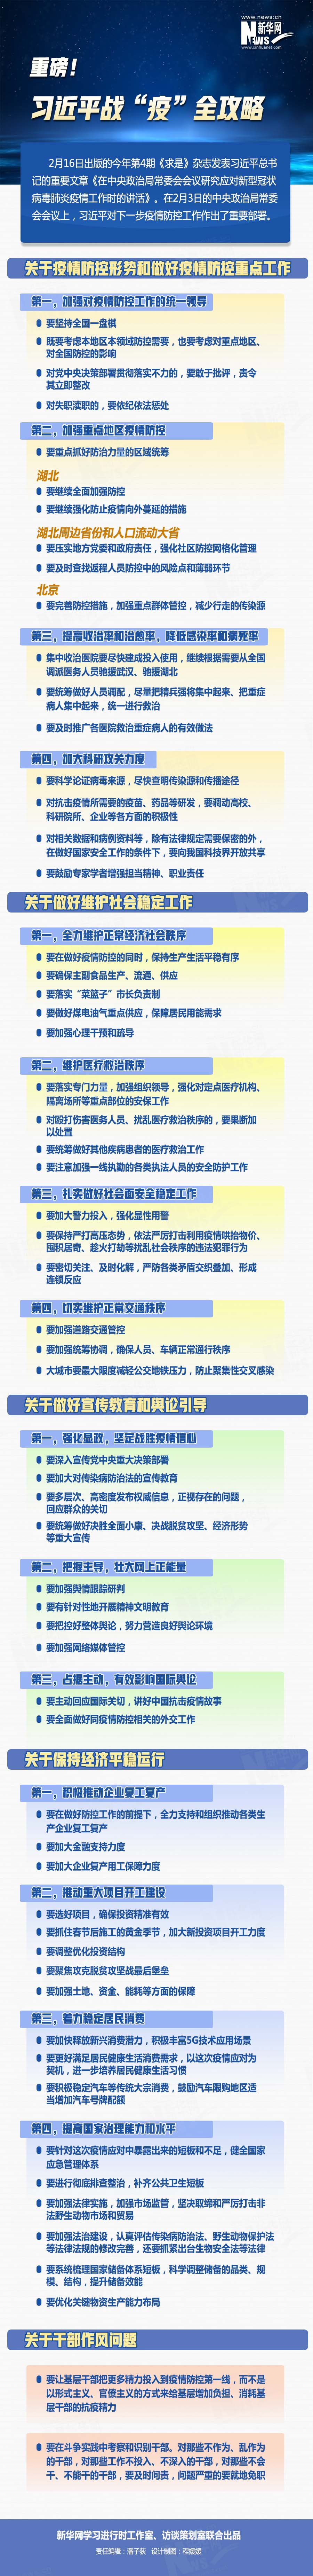 http://www.xinhuanet.com/politics/xxjxs/2020-02/16/1125583533_15818567328941n.jpg